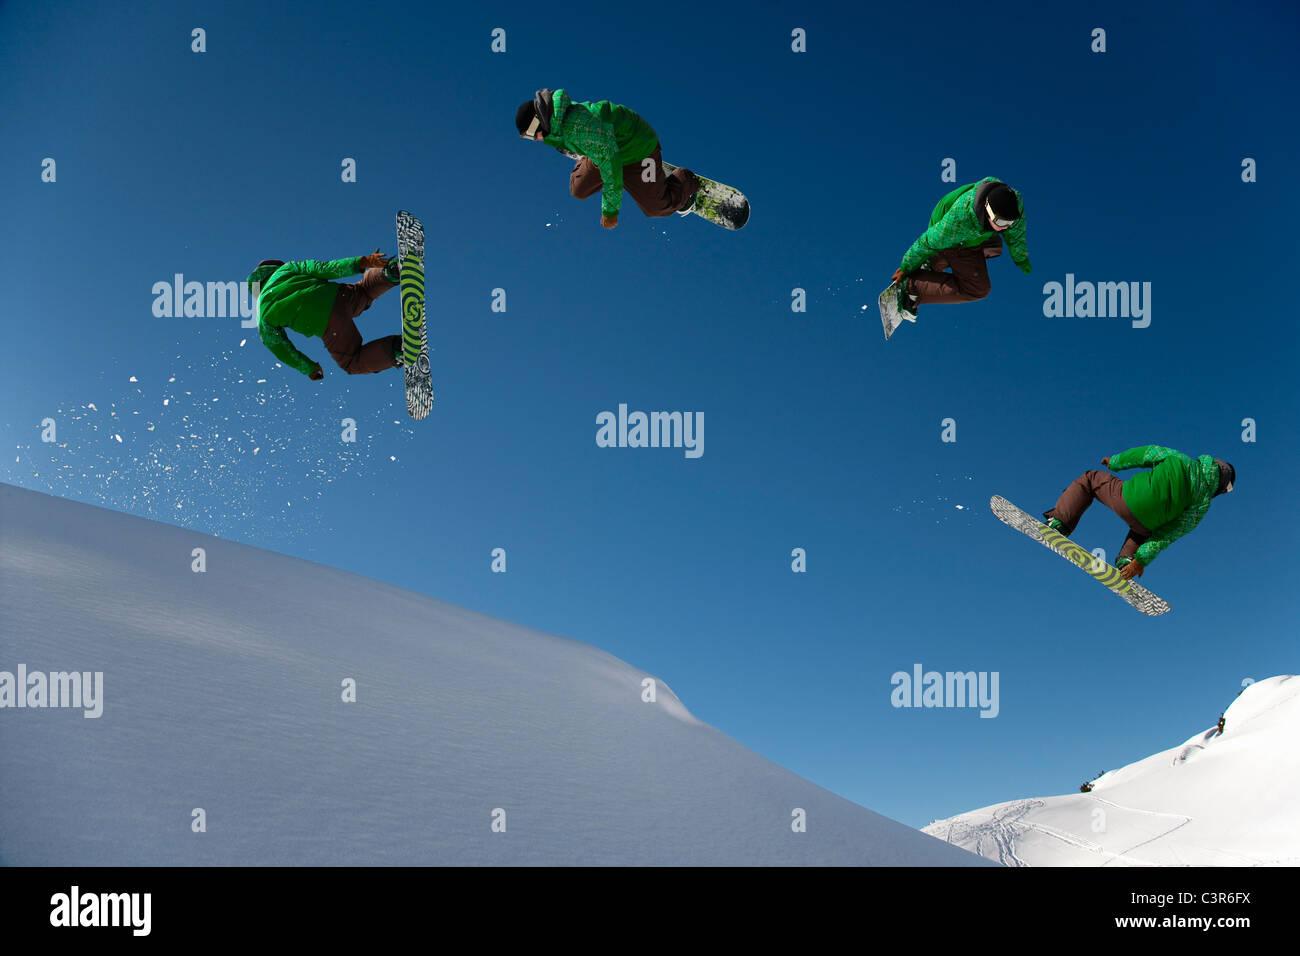 Snowboarder dangerous free ride jump Stock Photo